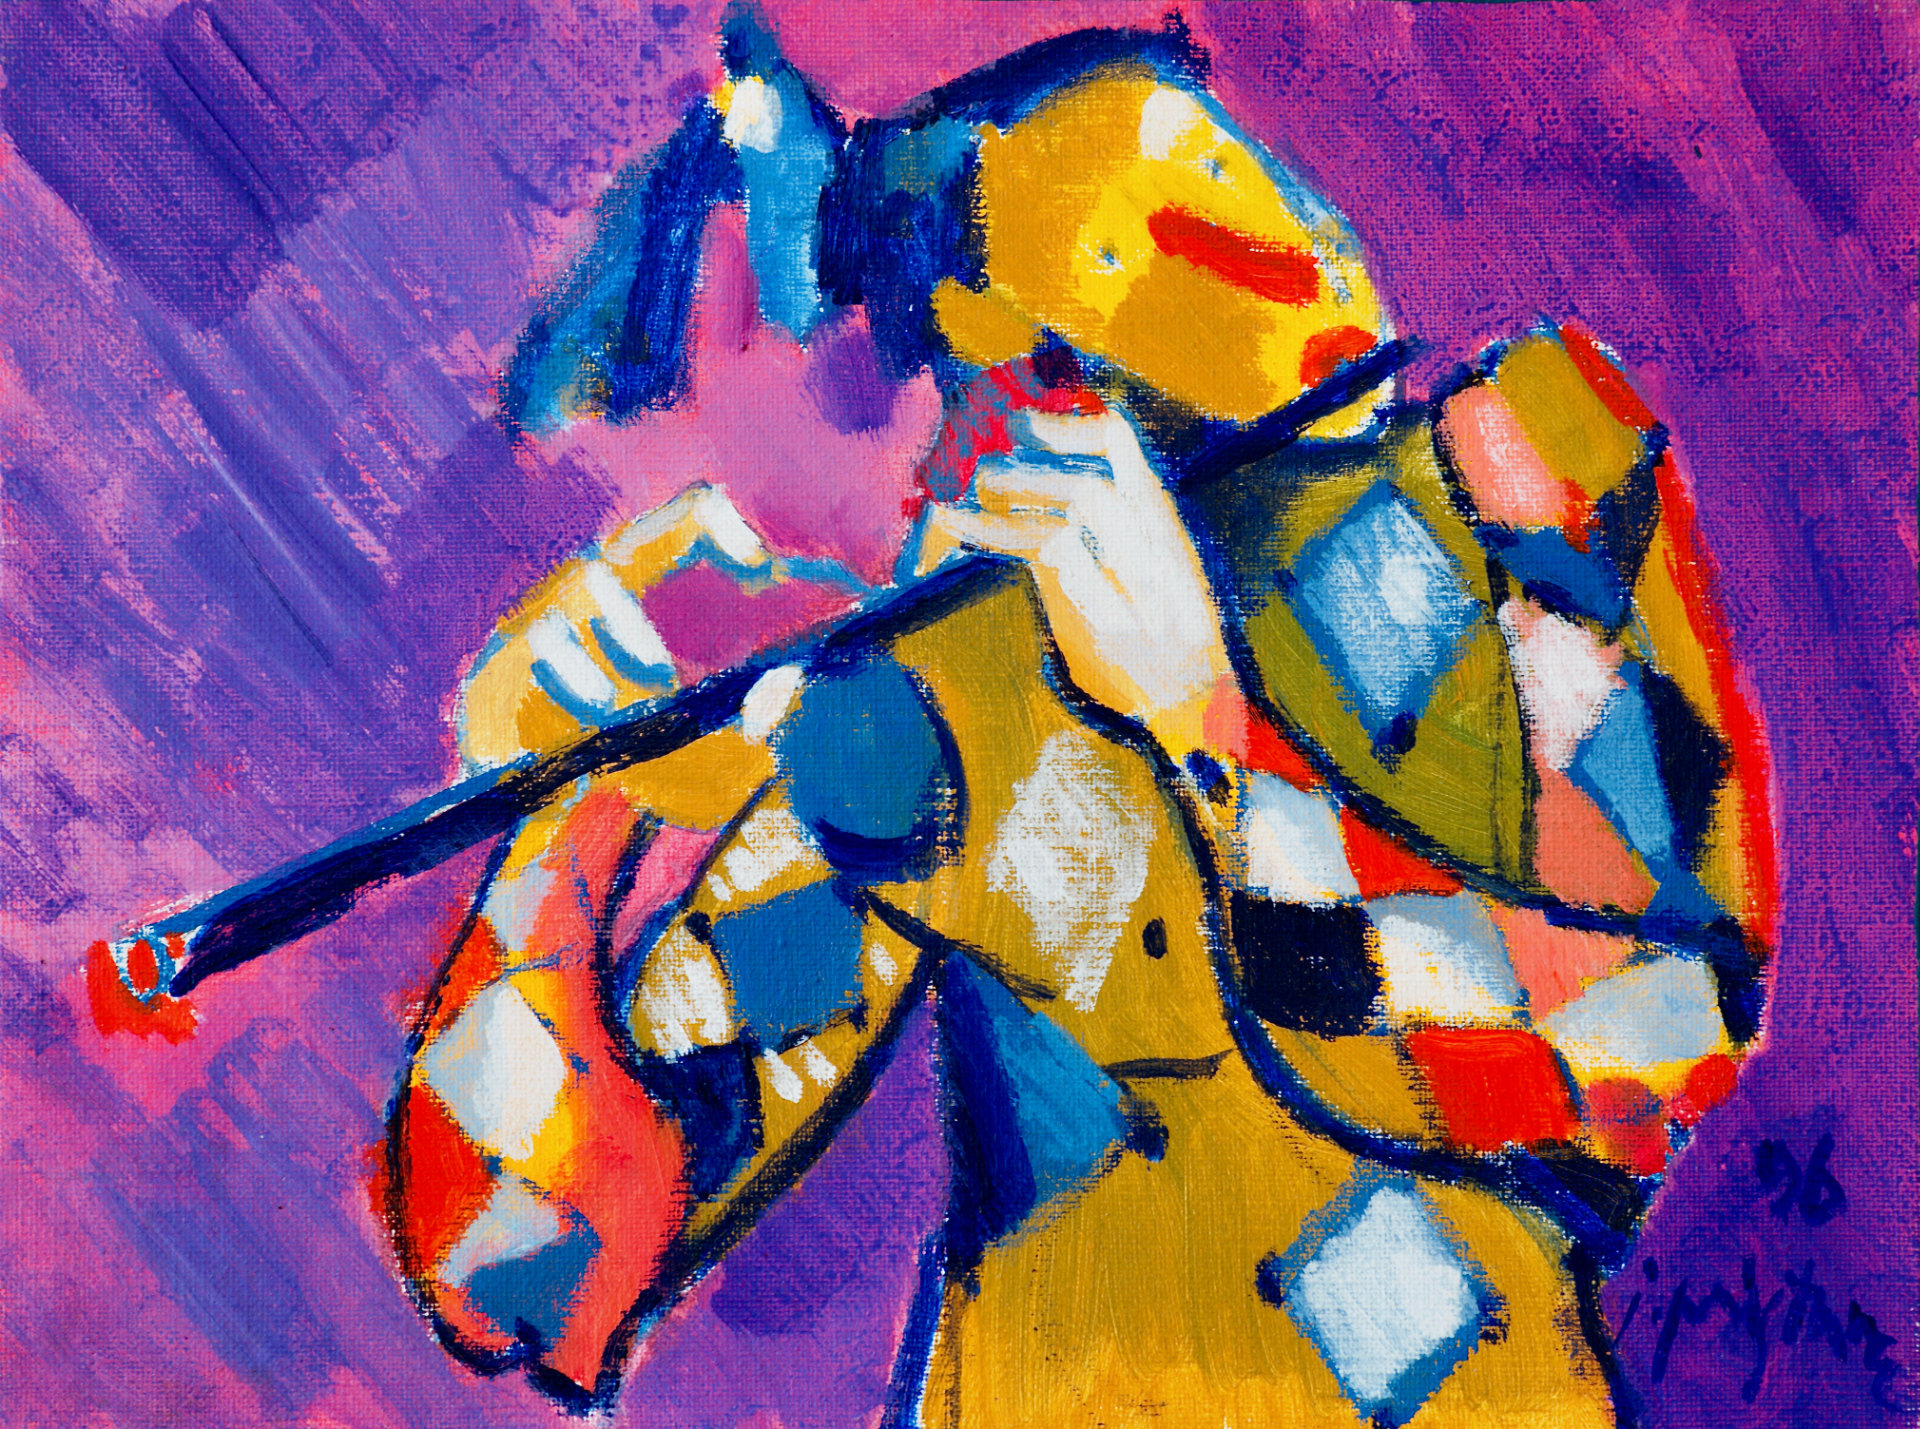 1996_figures_1996_40x30cm.jpg